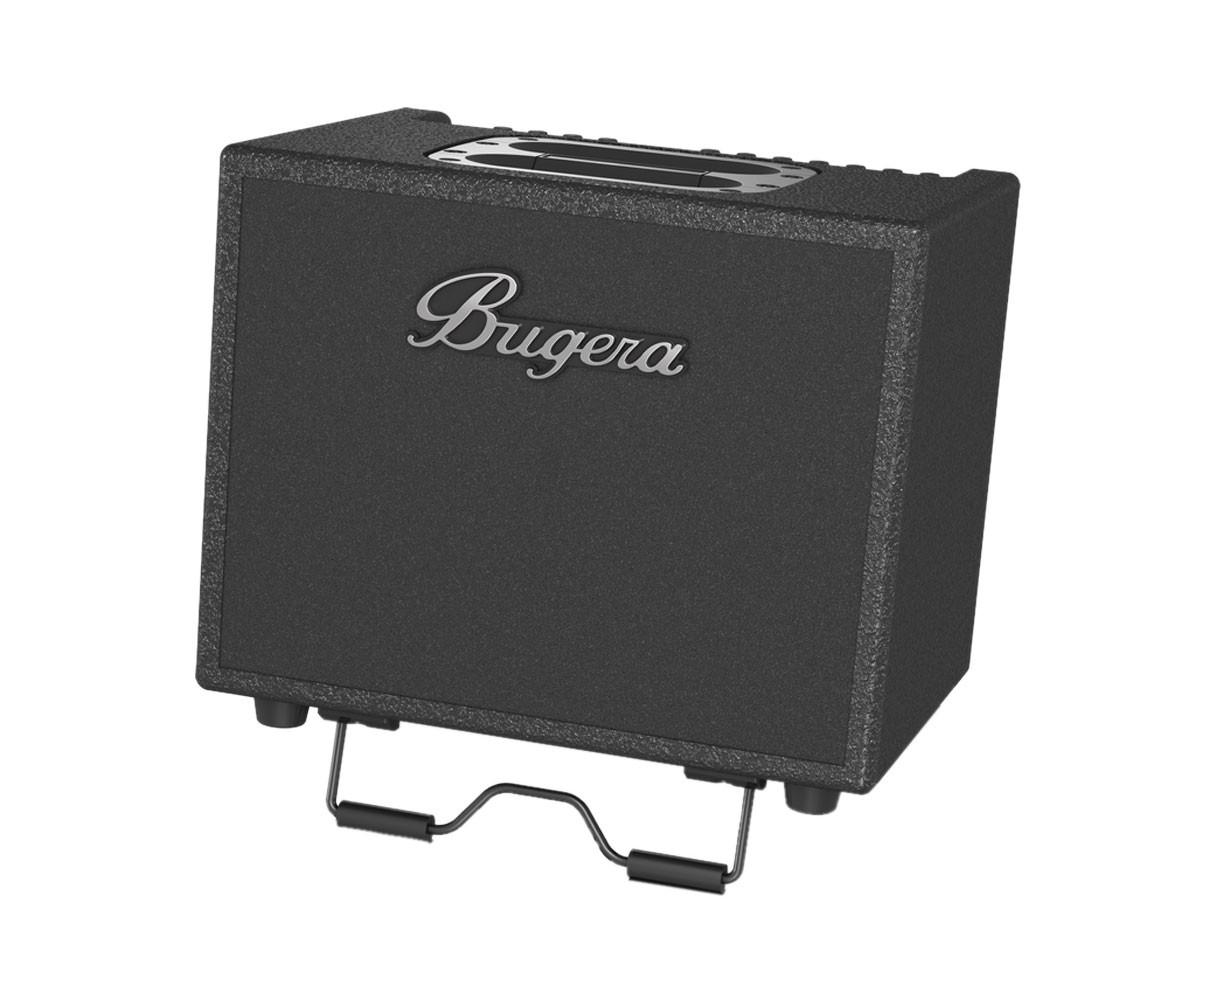 Bugera AC60 Portable 60-Watt, 2-Channel Acoustic Instrument Amplifier